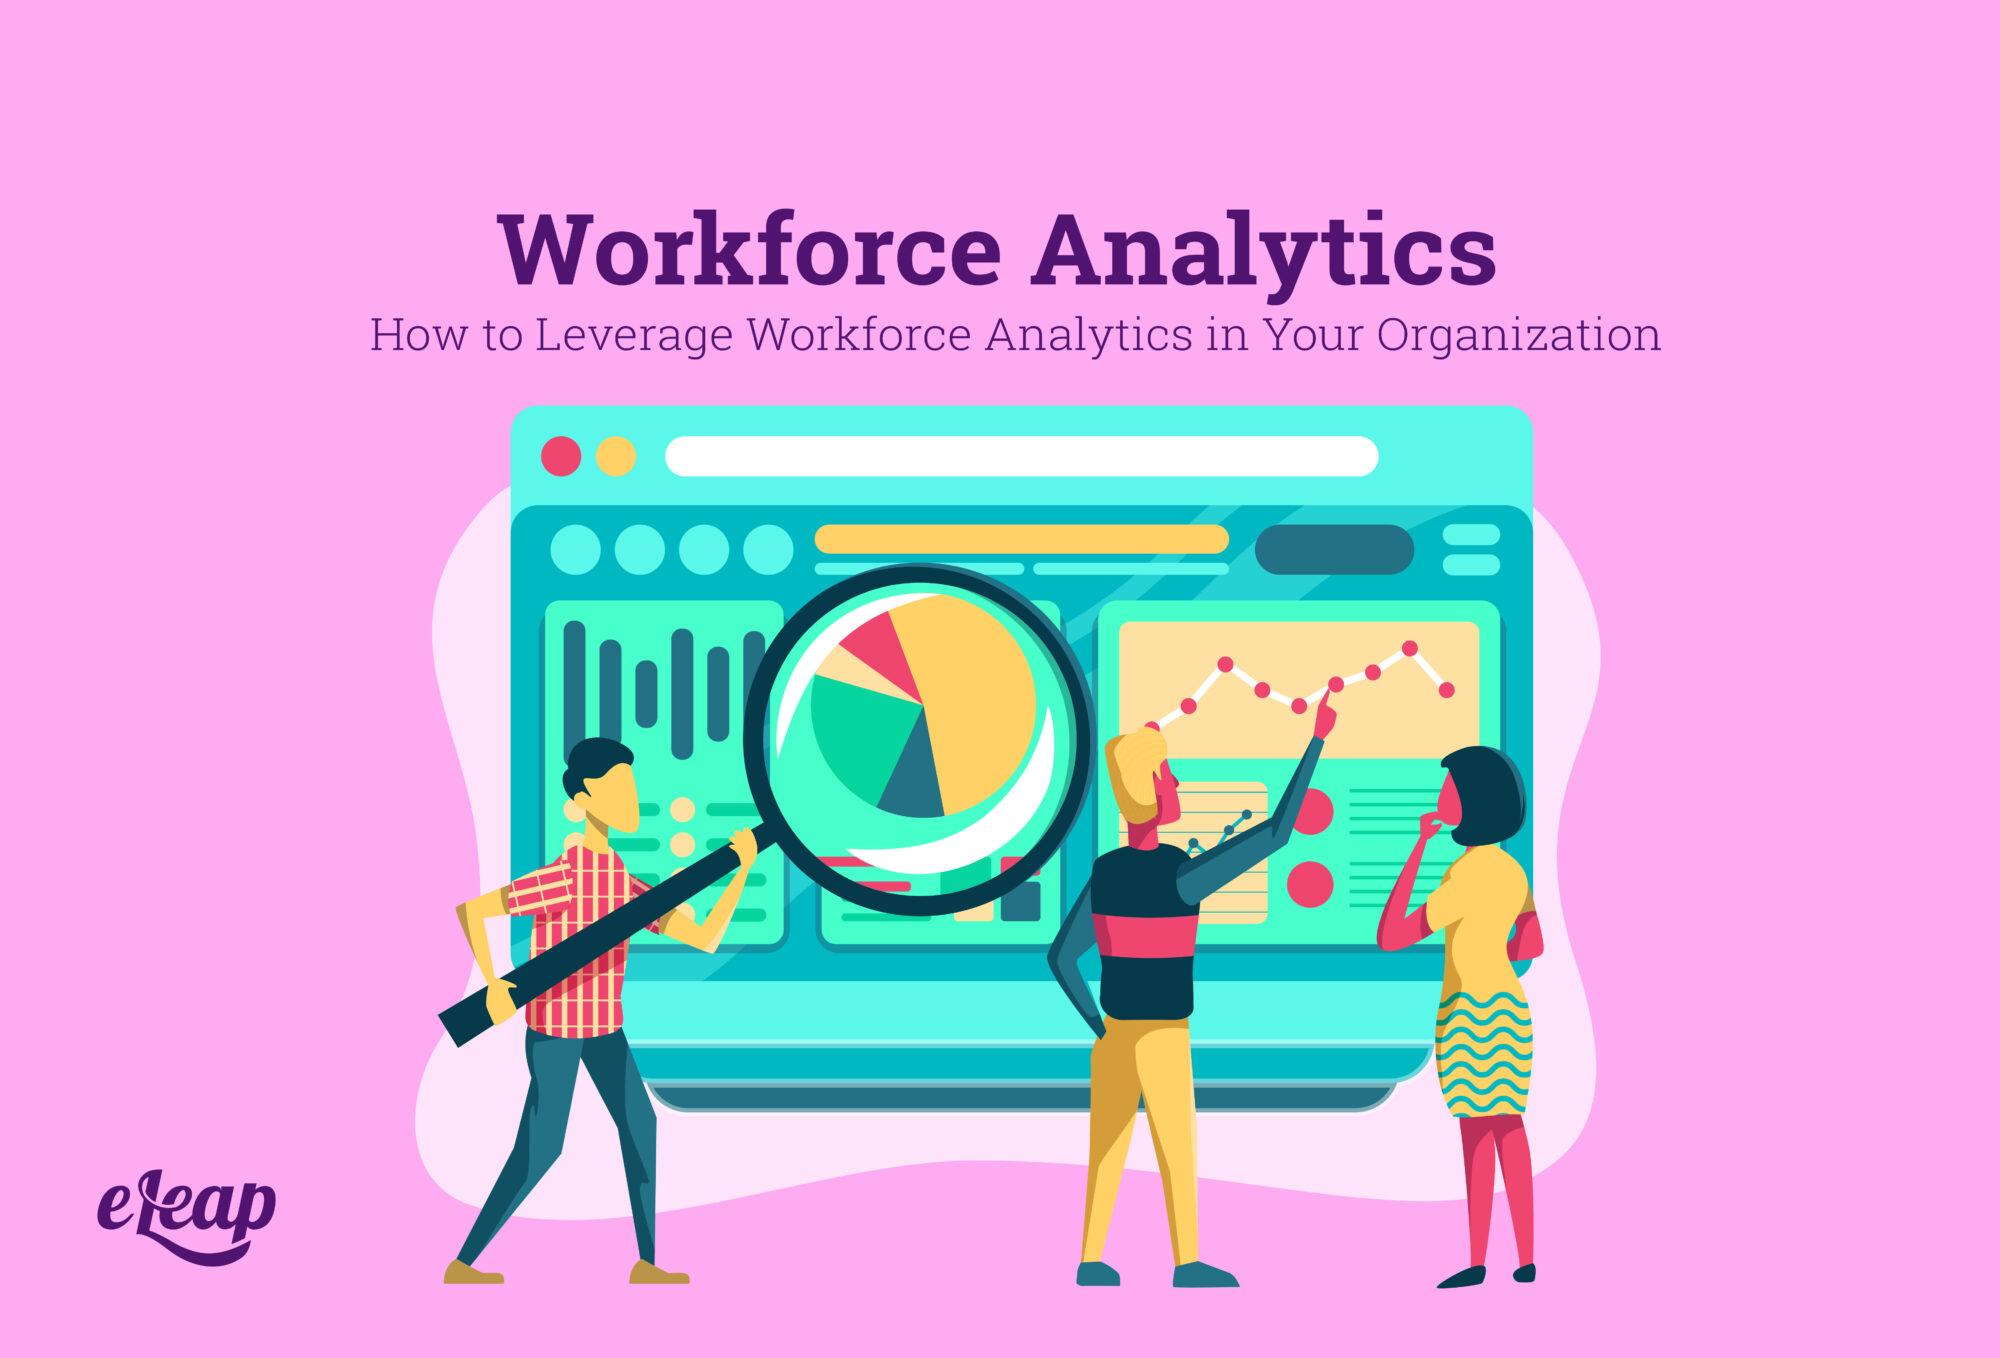 How to Leverage Workforce Analytics in Your Organization